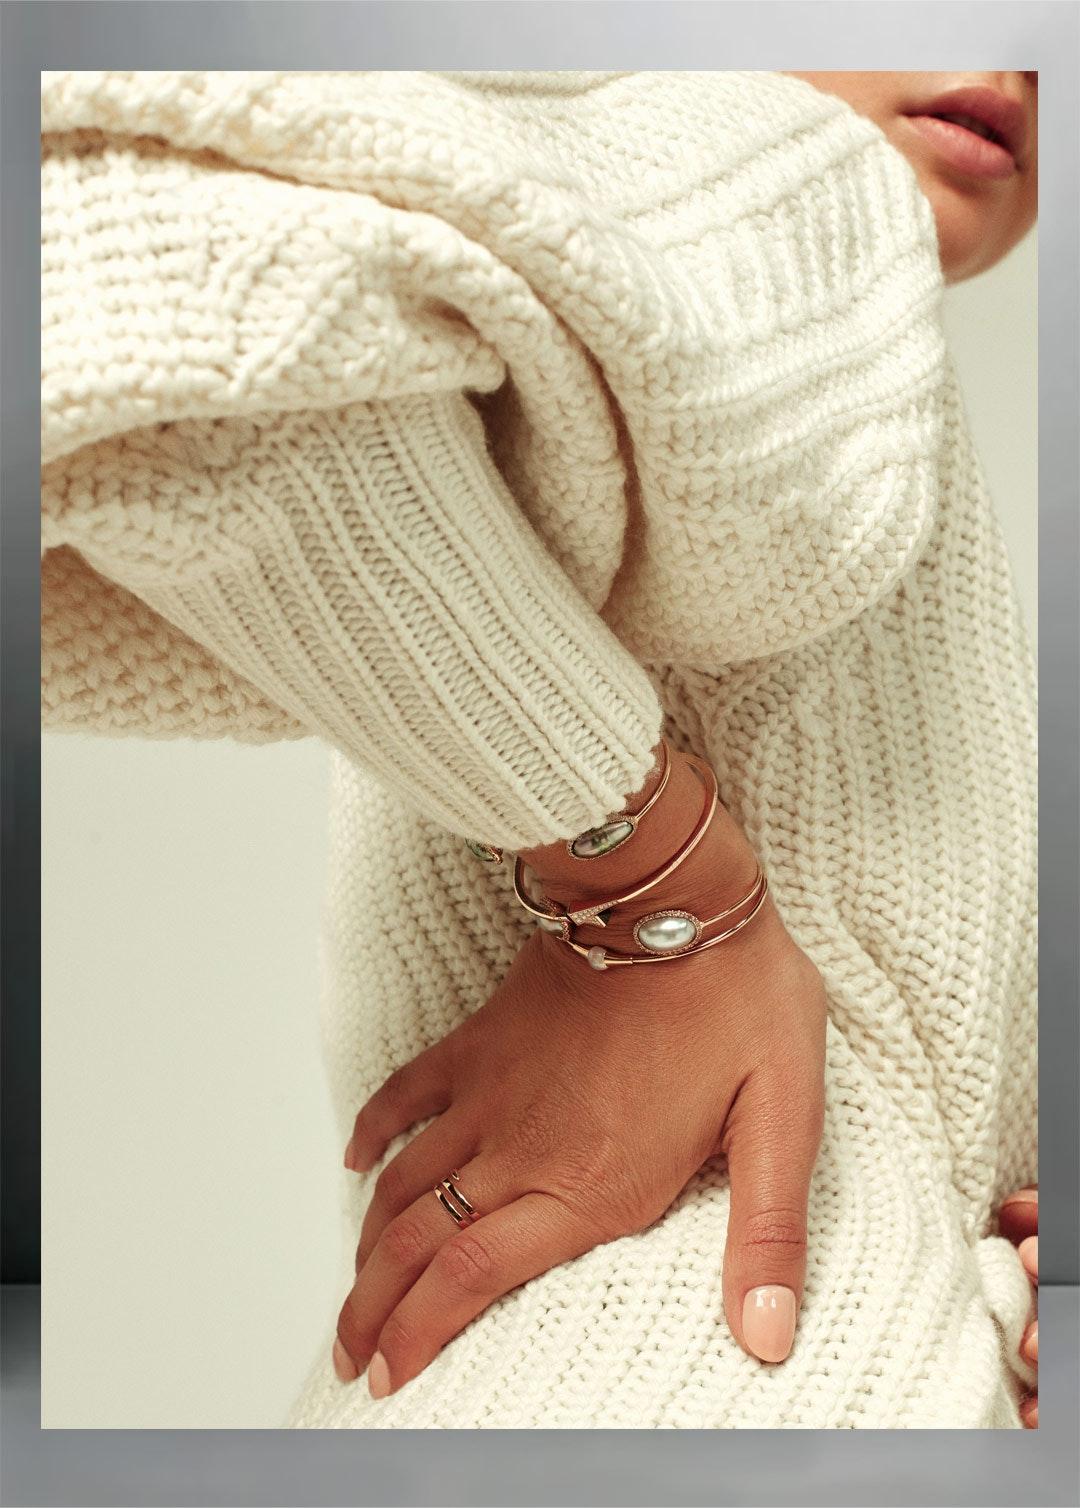 OUNASS_Jewellery_Kanj_Sisters_Sophie_Gerritsen